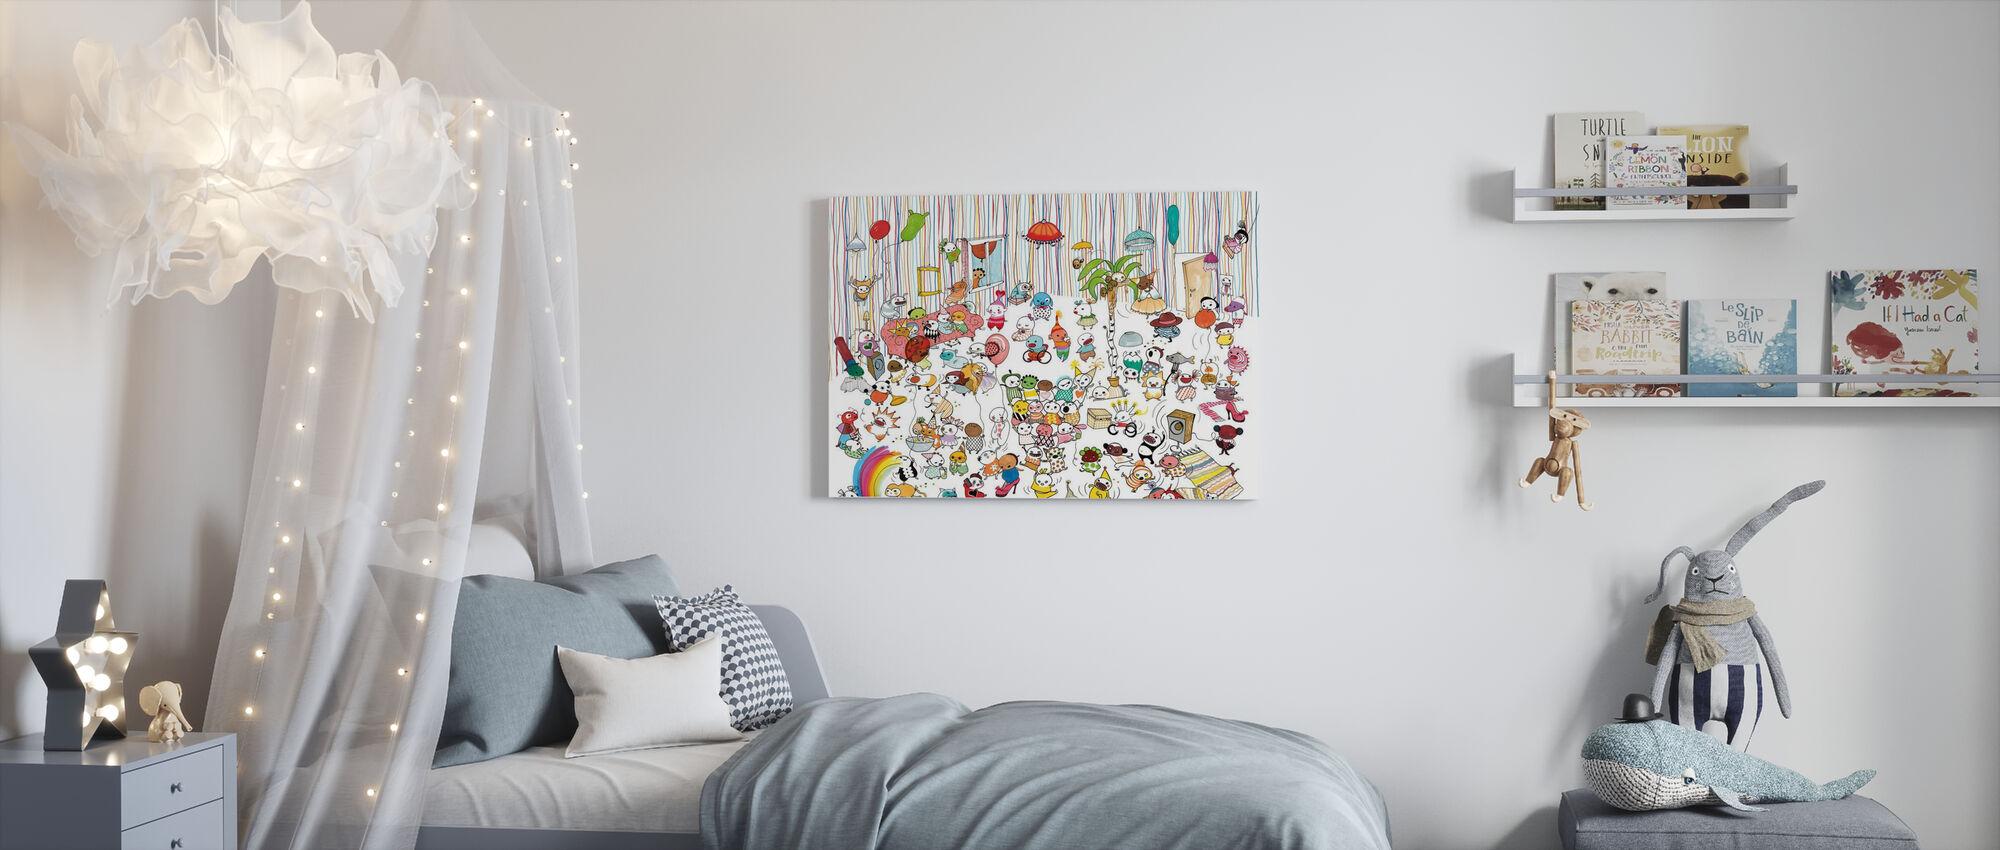 bonte partij 3 - Canvas print - Kinderkamer